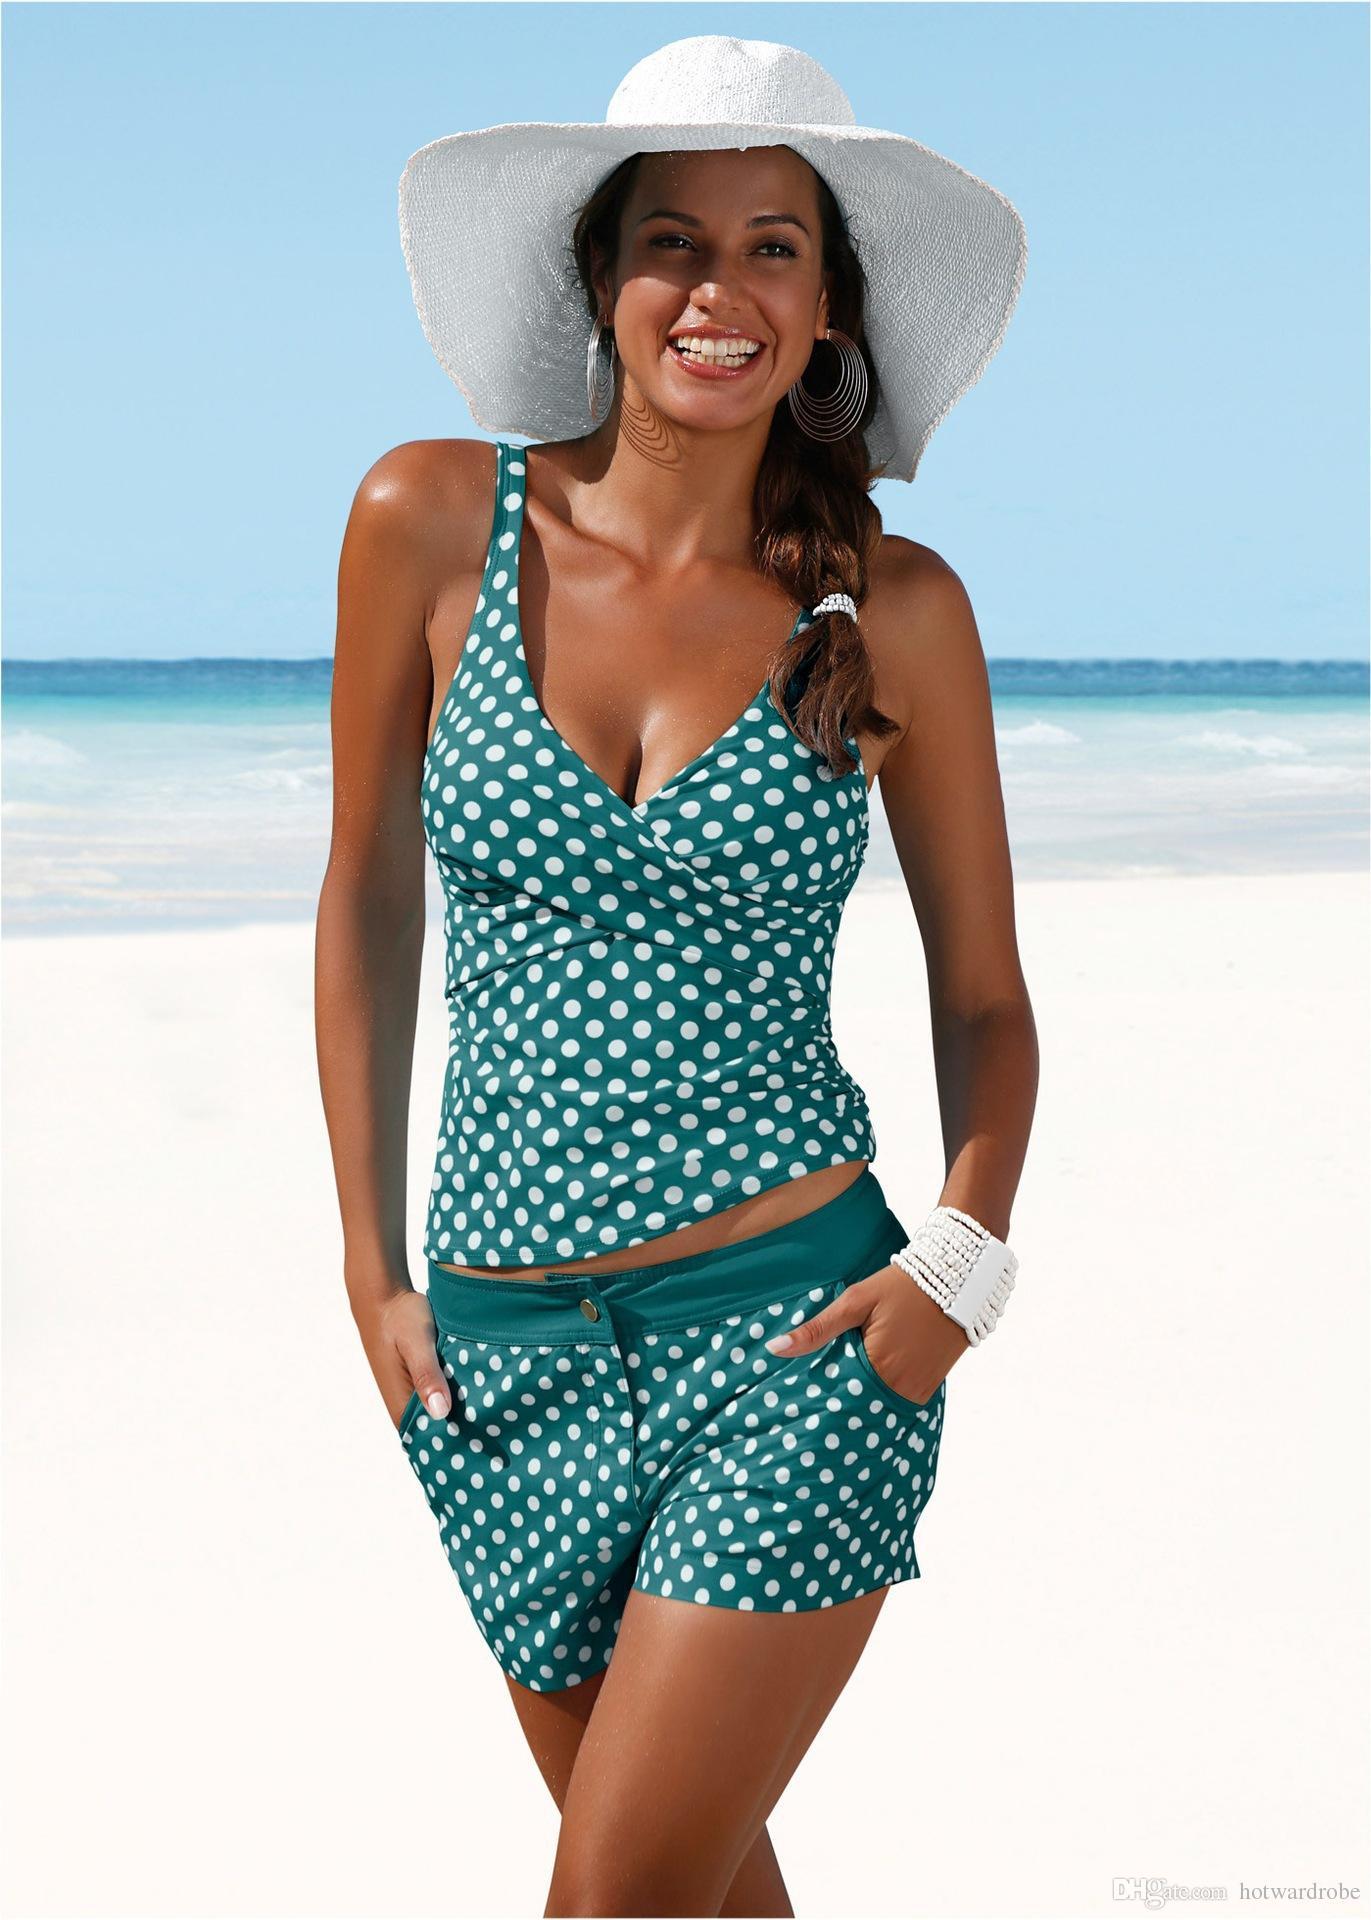 ea7c3354c86 2019 2018 New Plus Size Swimwear Women Swimsuit Two Pieces Tankini Padded Bathing  Suit Polka Dot High Waist Bikini Set Beachwear From Hotwardrobe, ...